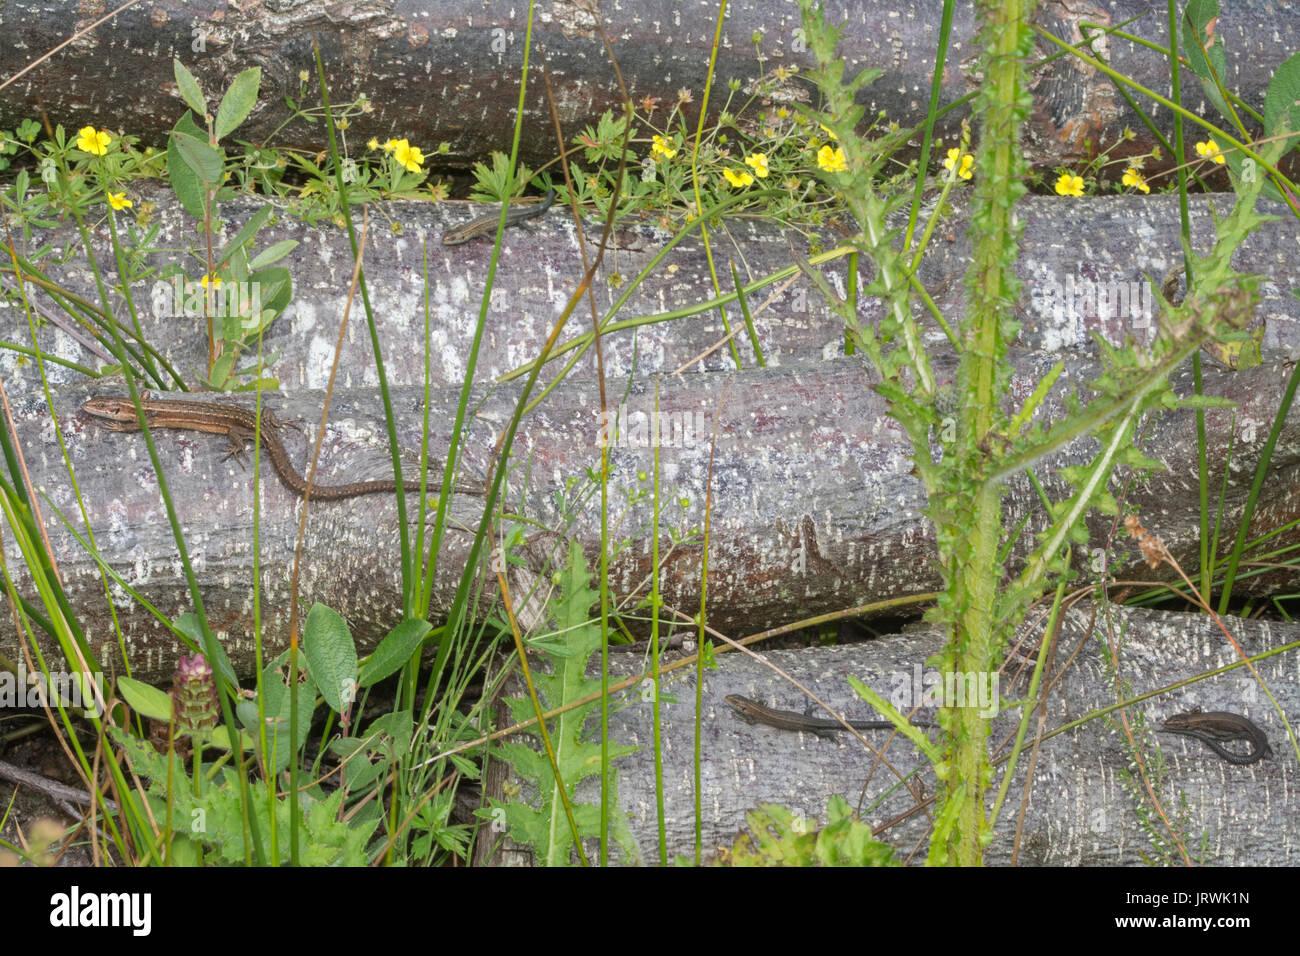 Adult and juvenile common lizards, also called viviparous lizards (Zootoca vivipara) basking on a log pile Stock Photo